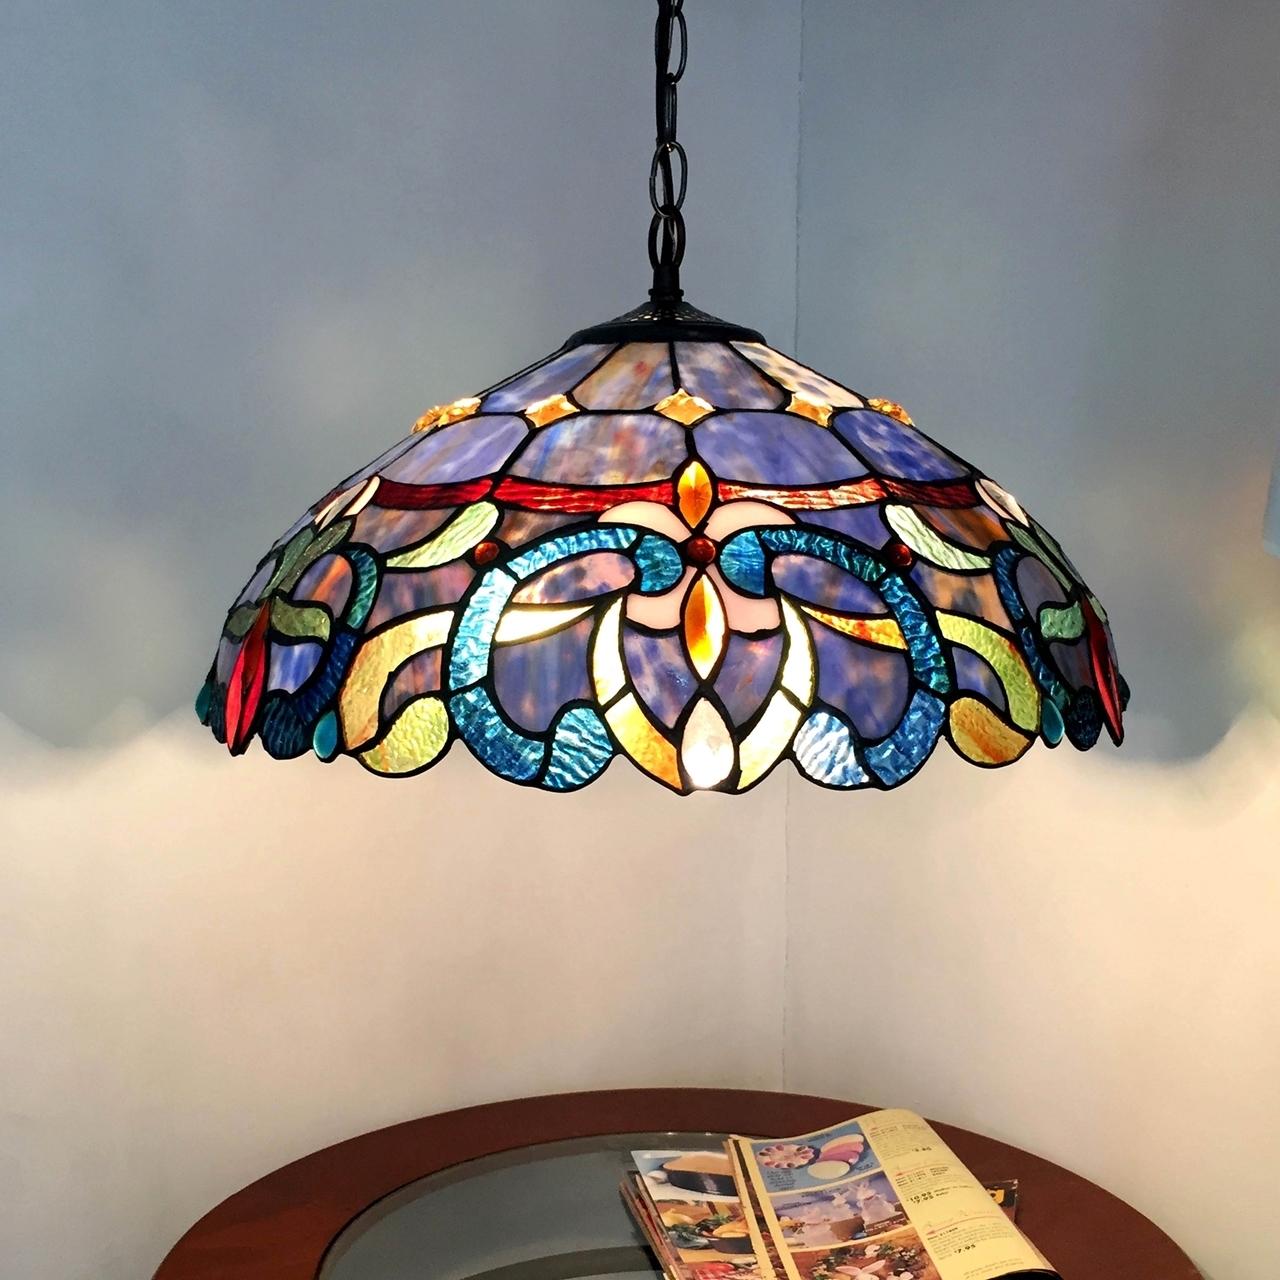 CHLOE Lighting Inc CHLOE Lighting NORA Tiffany Style